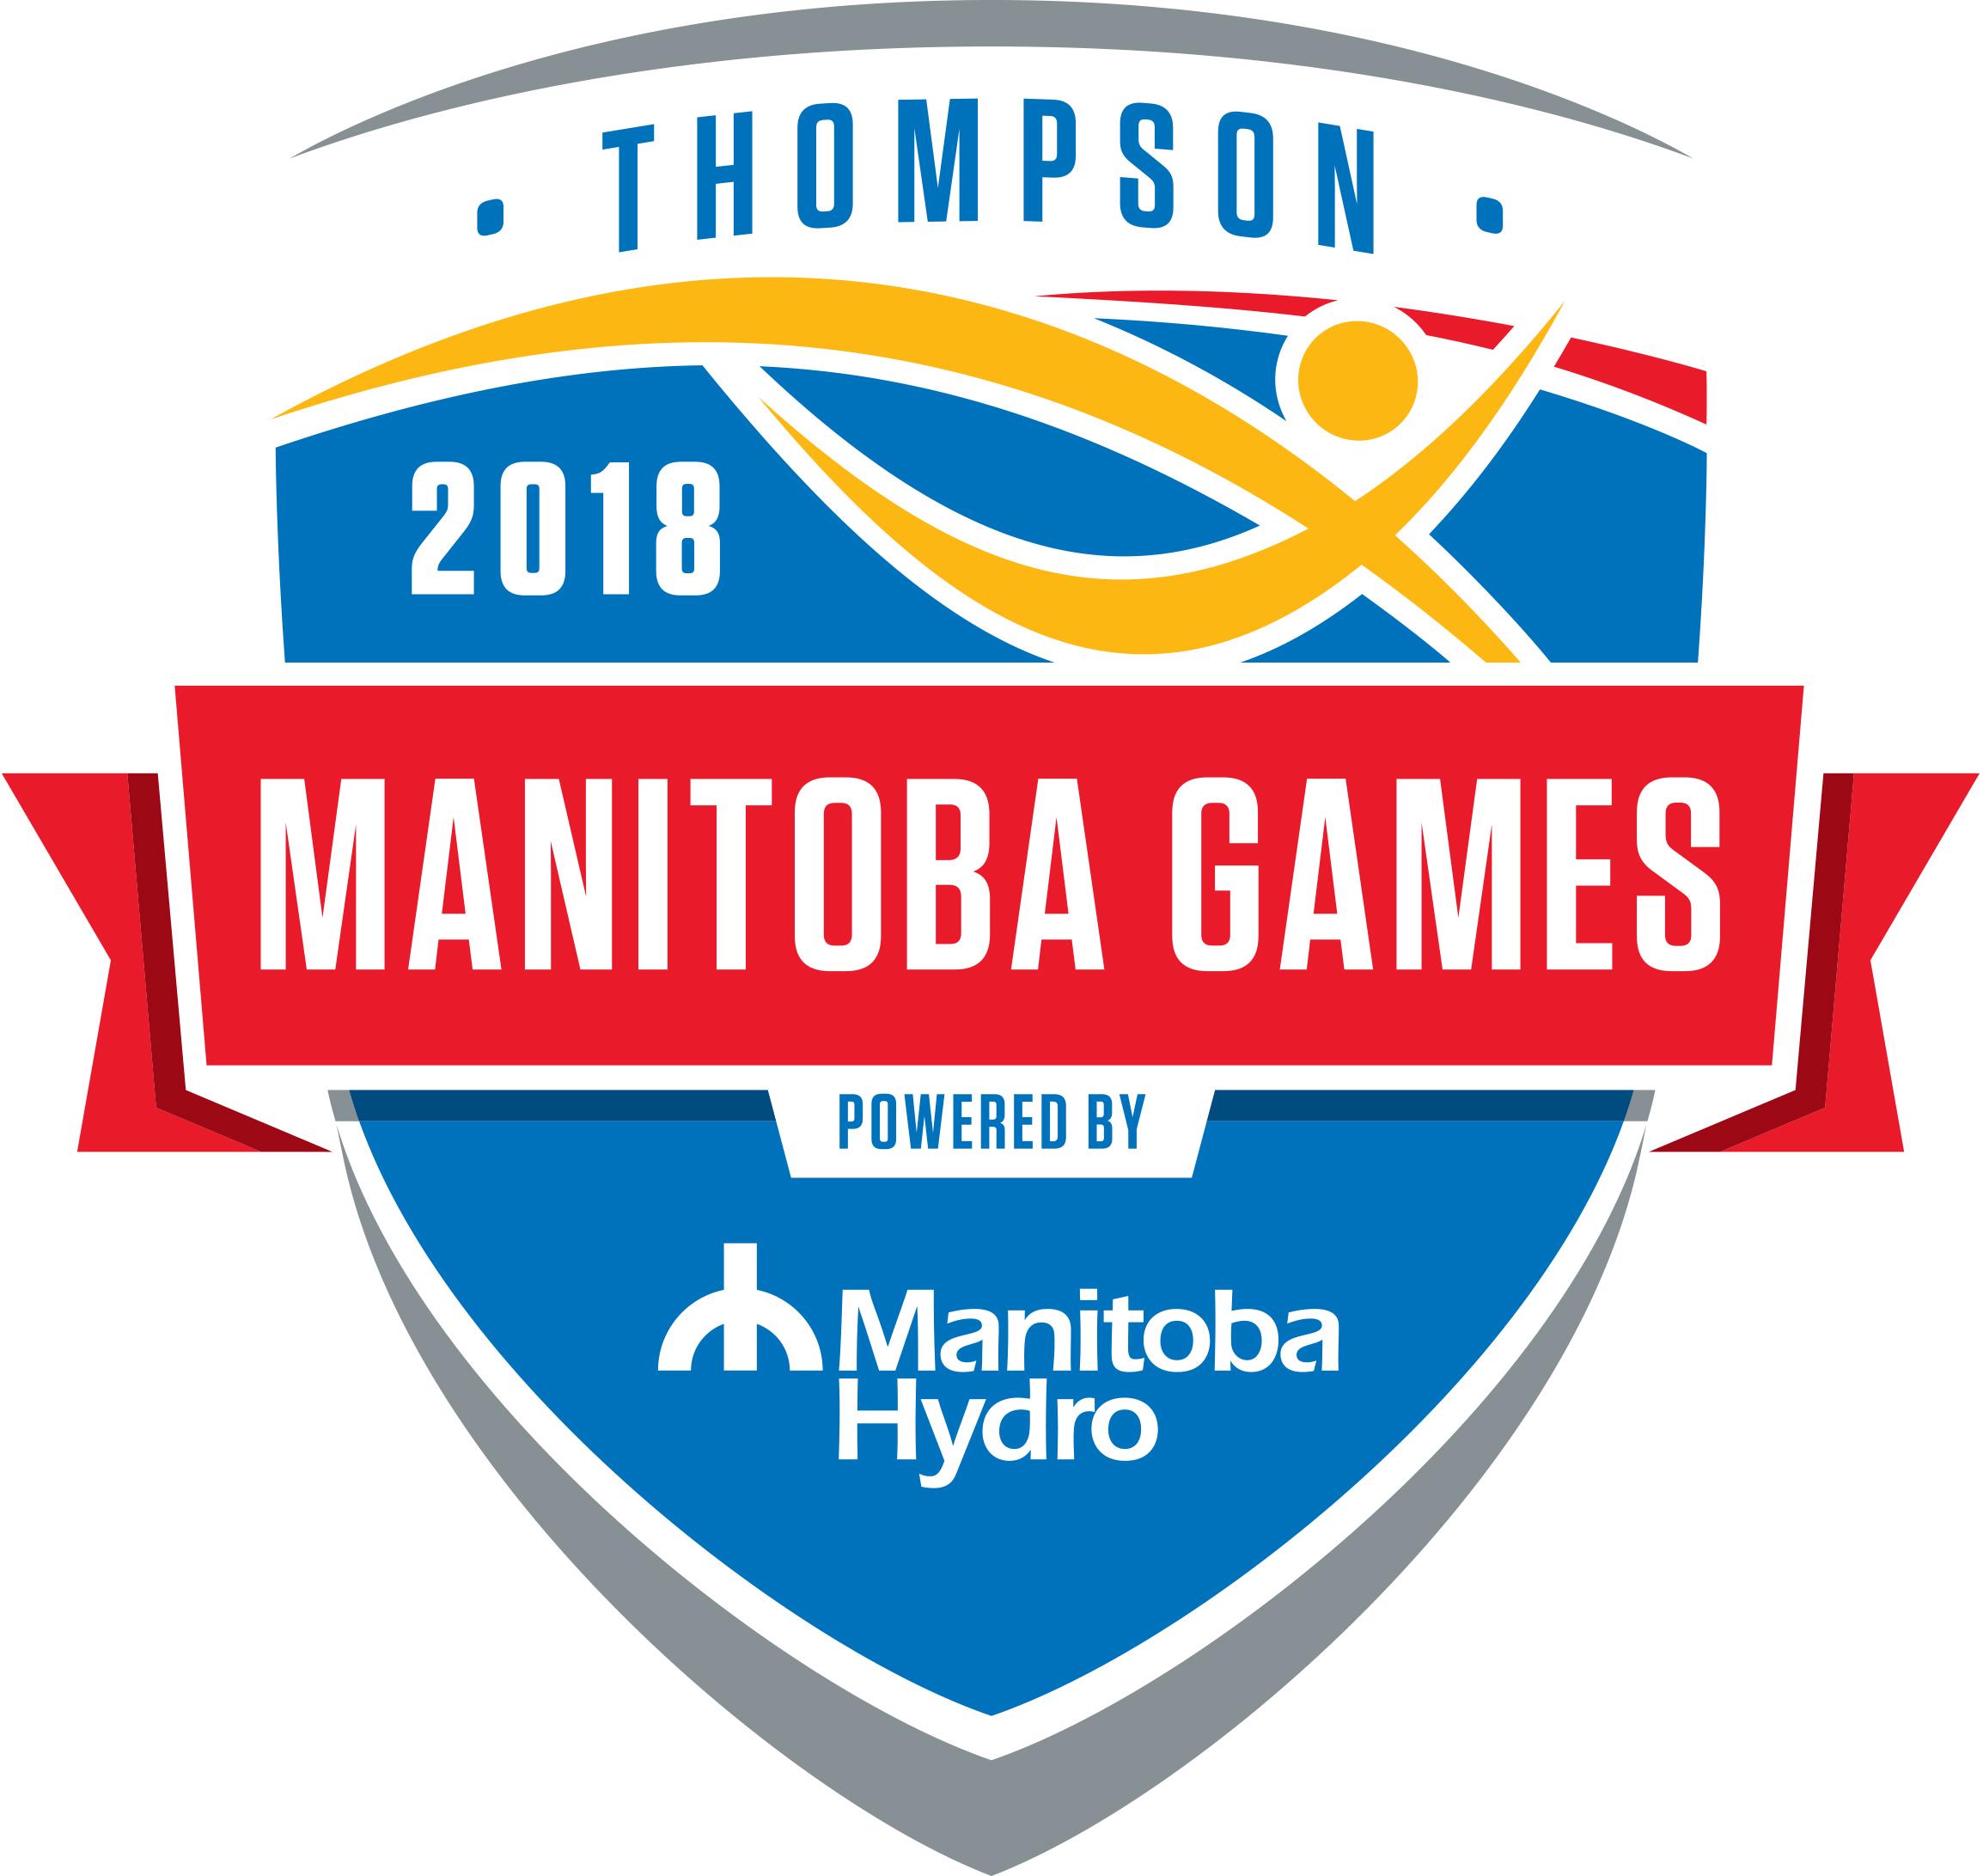 Manitoba Gaming